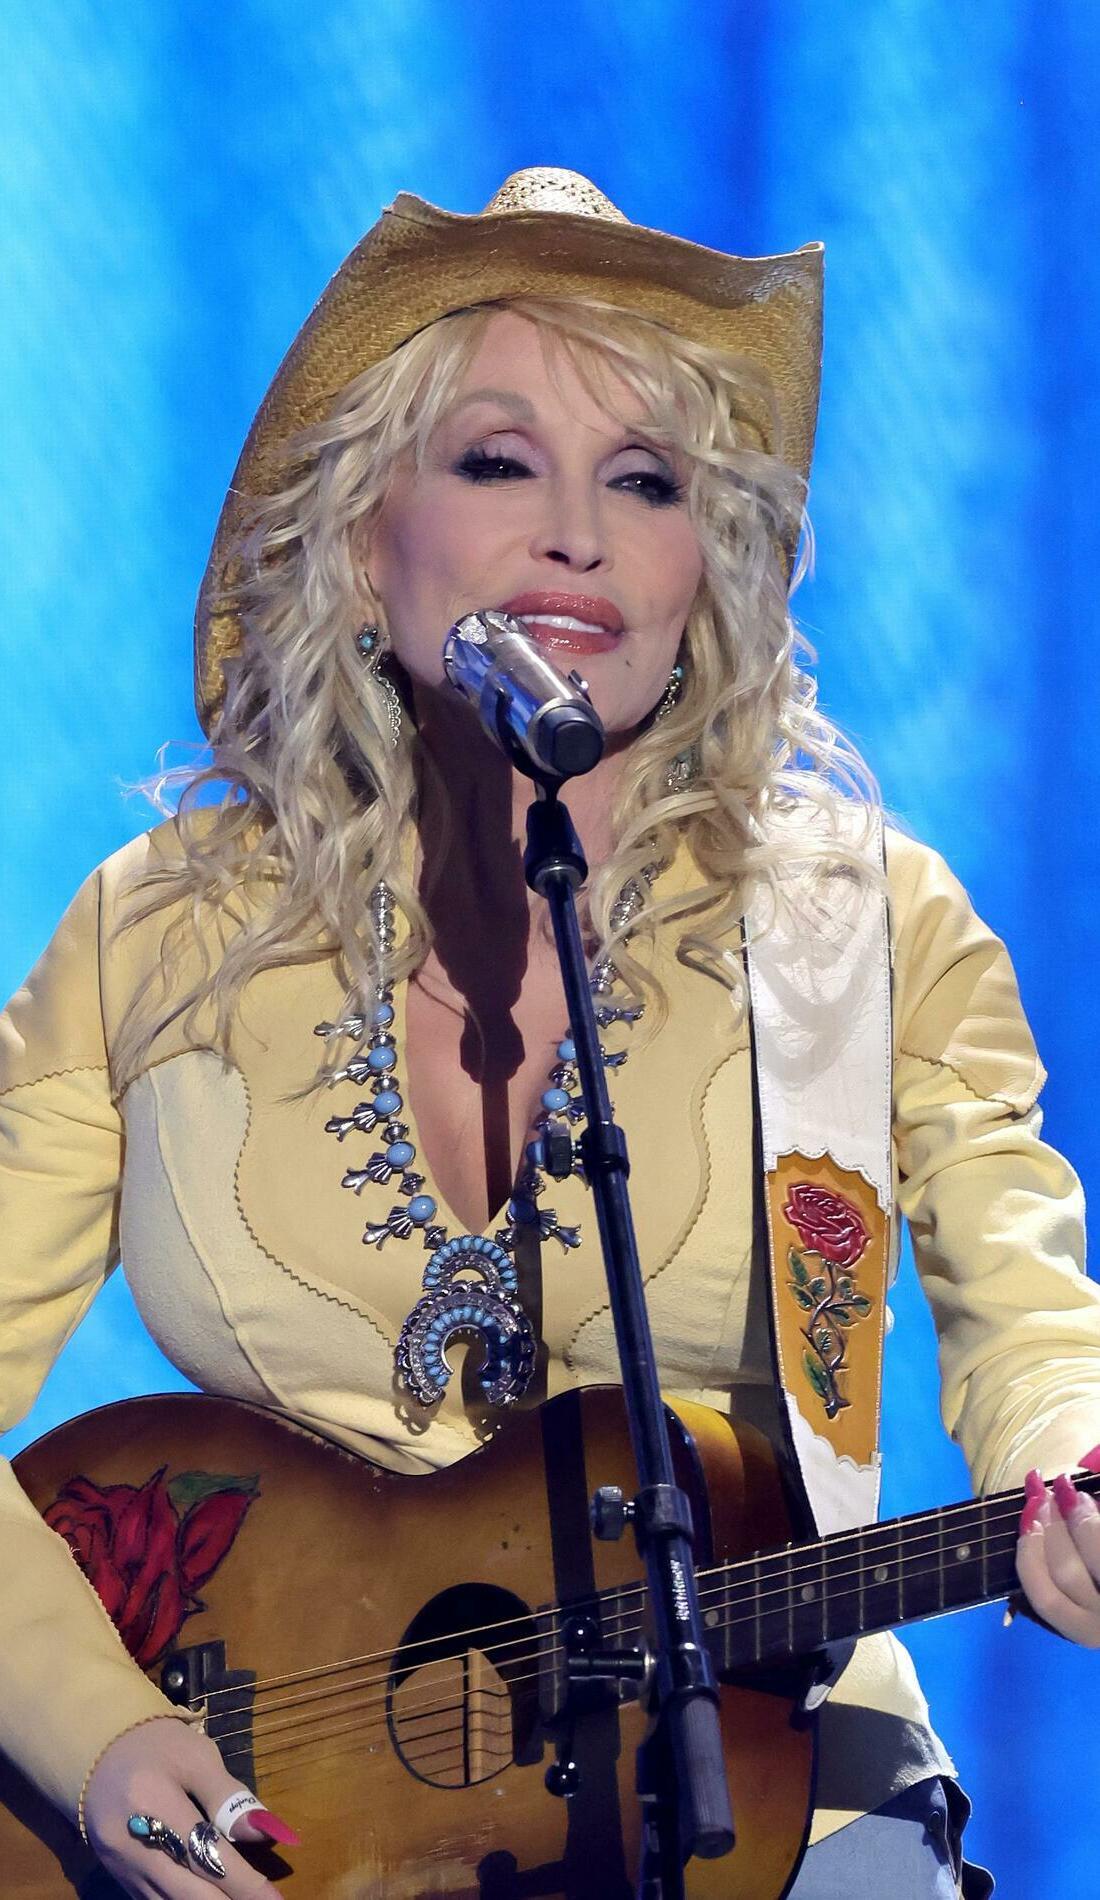 A Dolly Parton live event